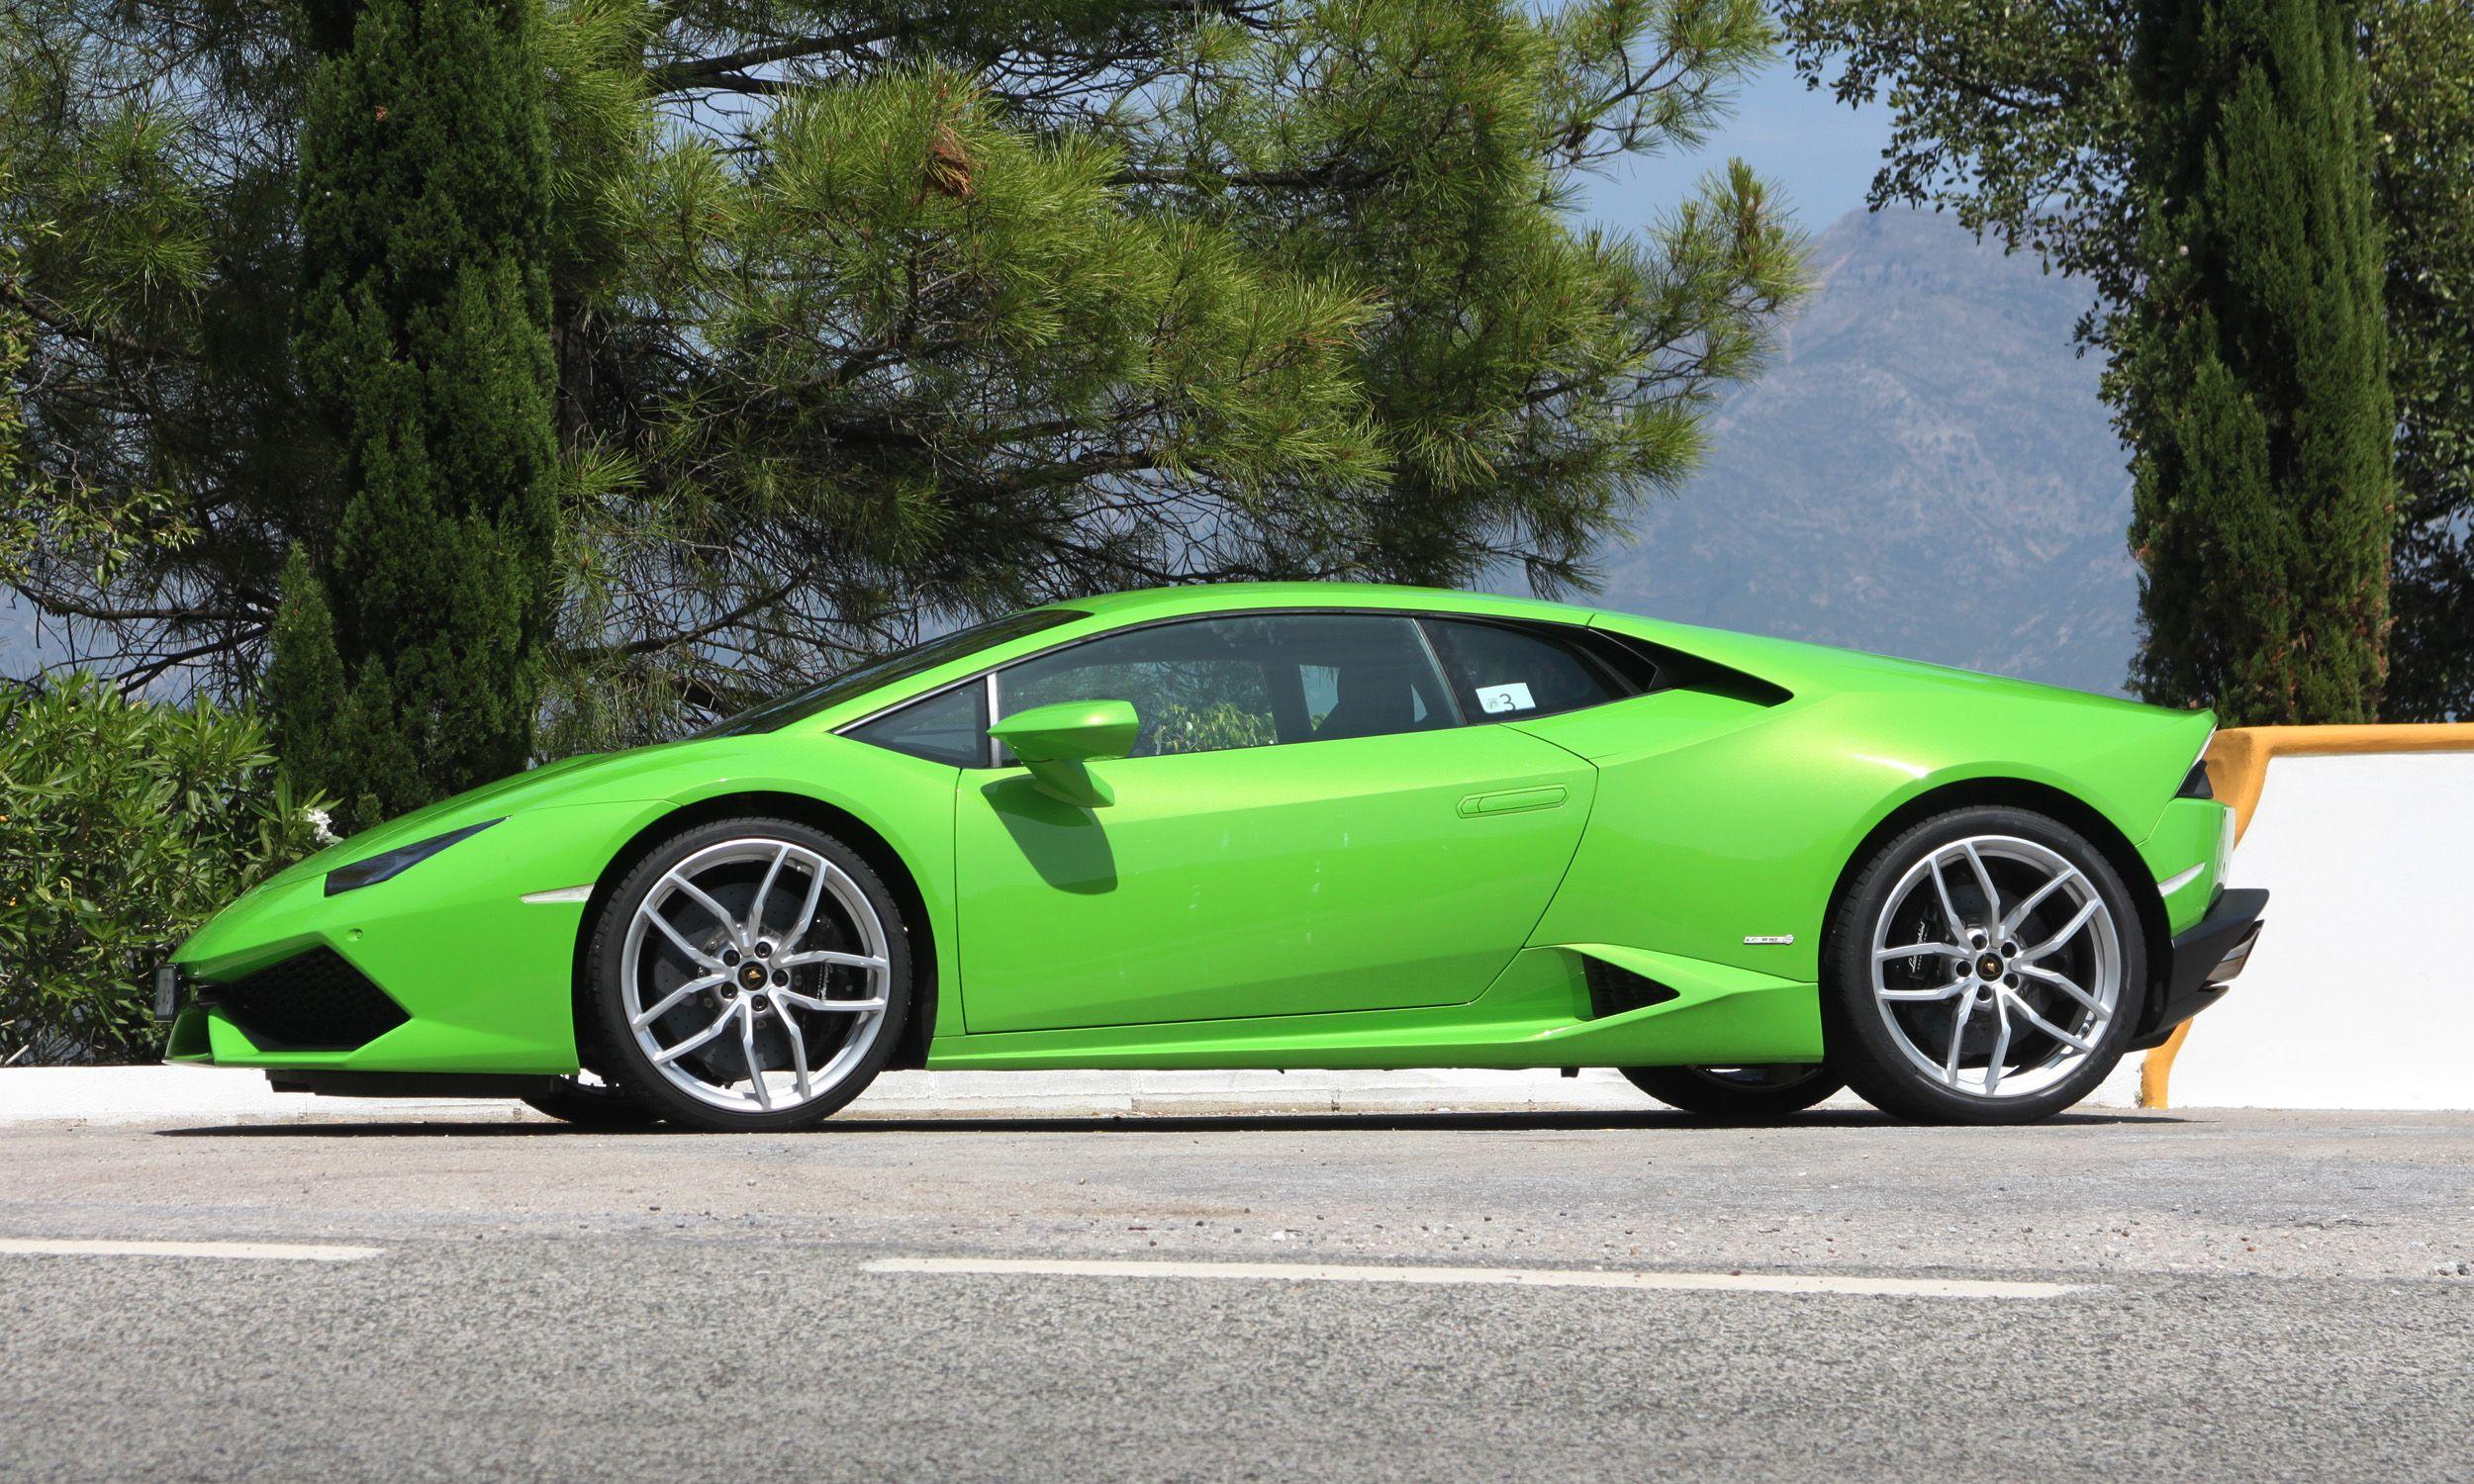 69140131db6999def4d21747b17ec017 Exciting Lamborghini Huracán Lp 610-4 Cena Cars Trend